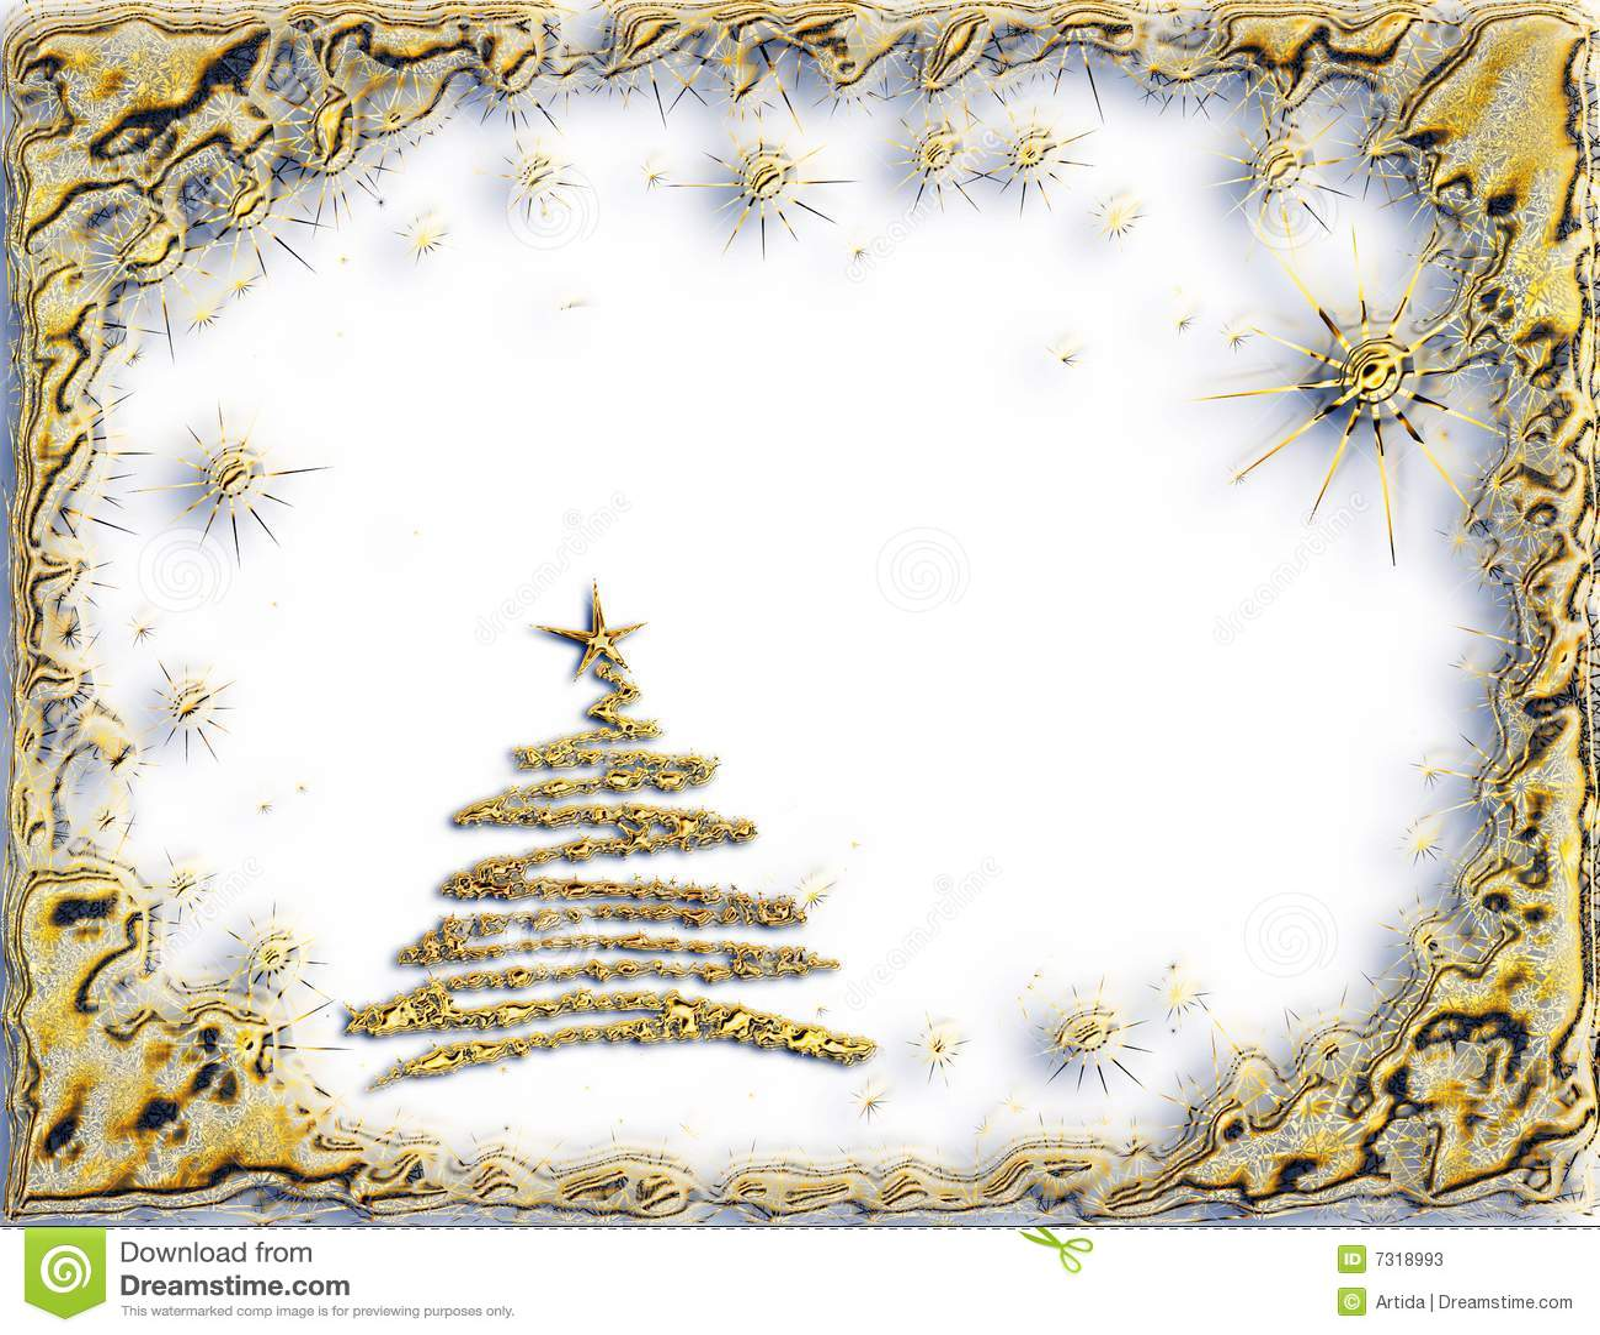 Big W White Christmas Tree: Golden Starry Christmas Tree On White Background Stock